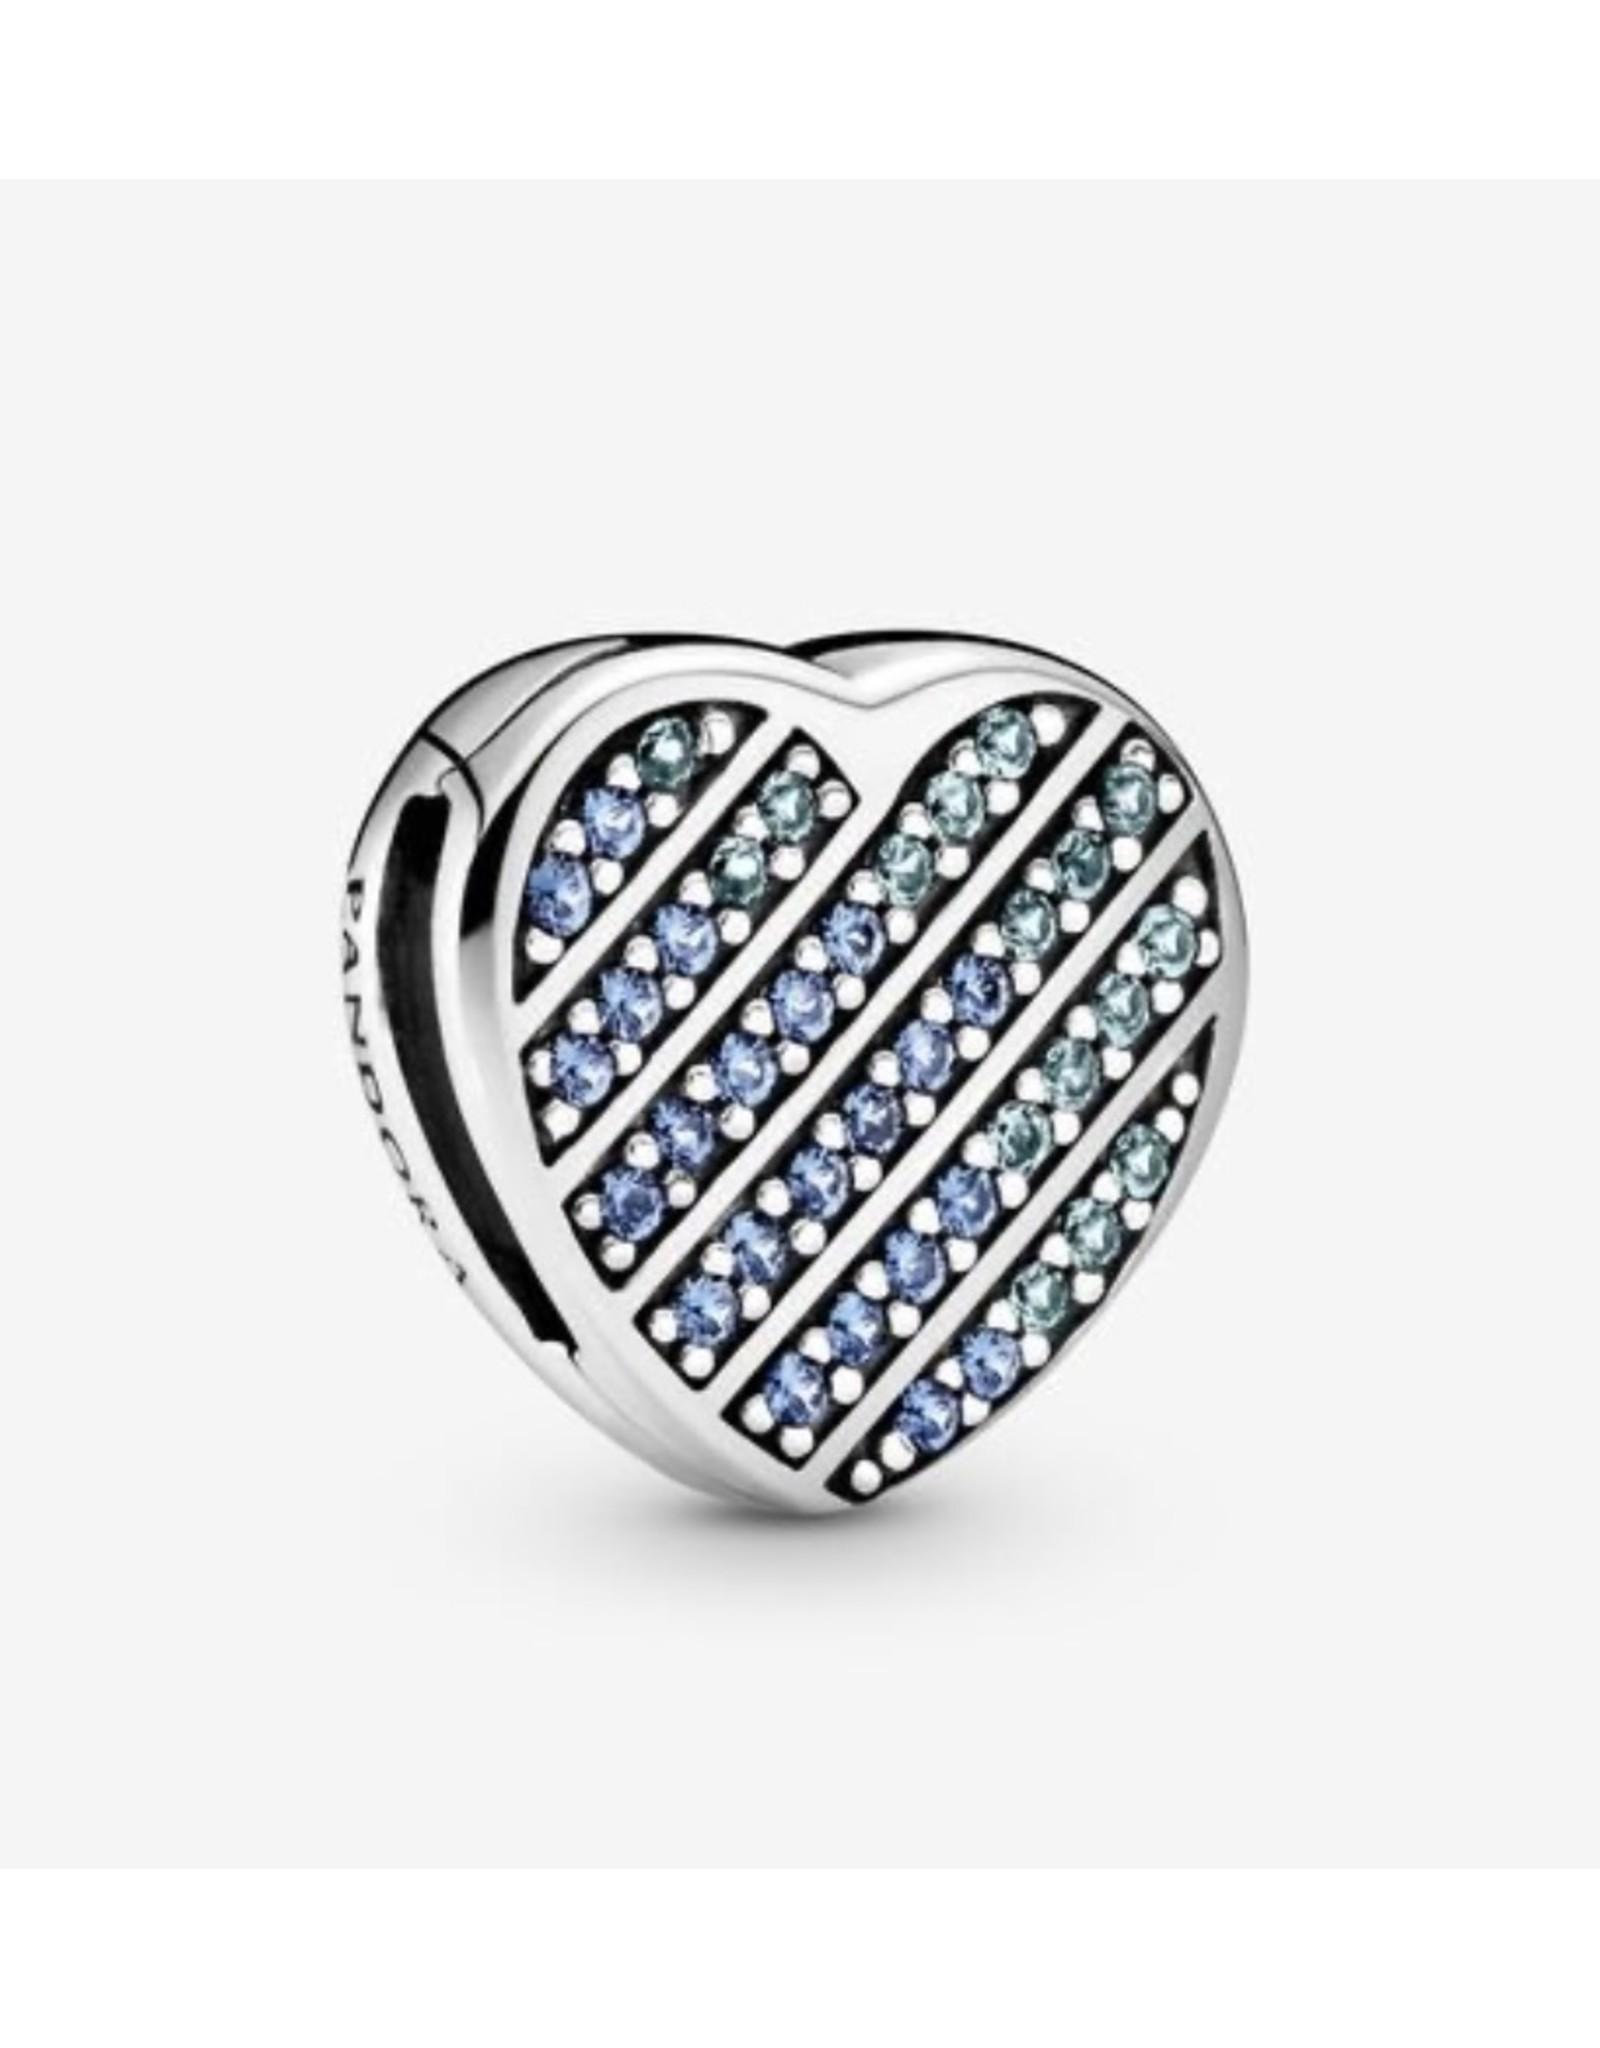 Pandora Pandora Charm,799346C01, Blue Pave Heart, Blue Crystal